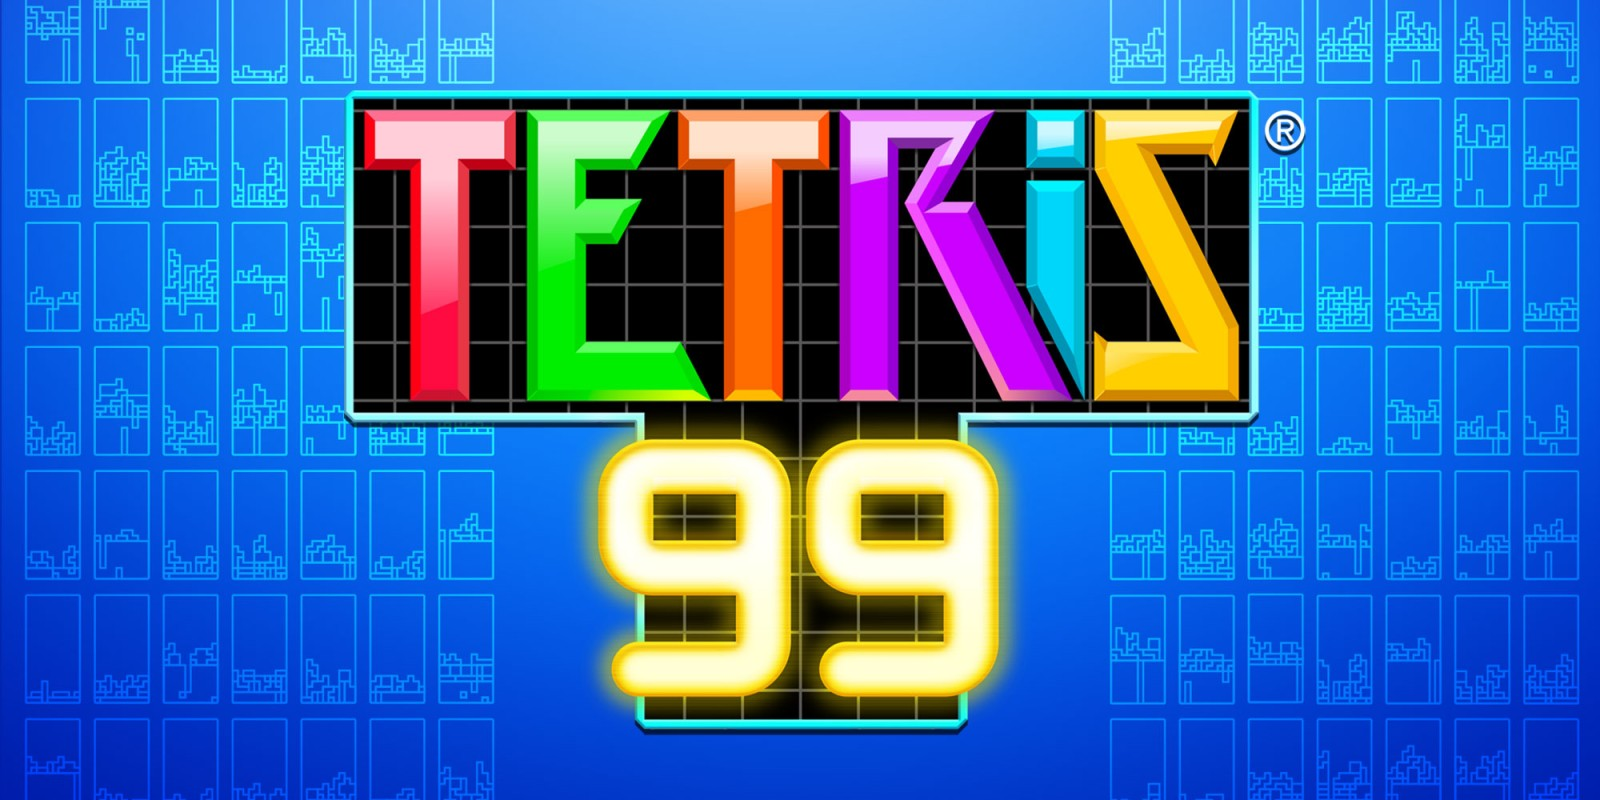 H2x1_NSwitchDS_Tetris99_image1600w.jpg